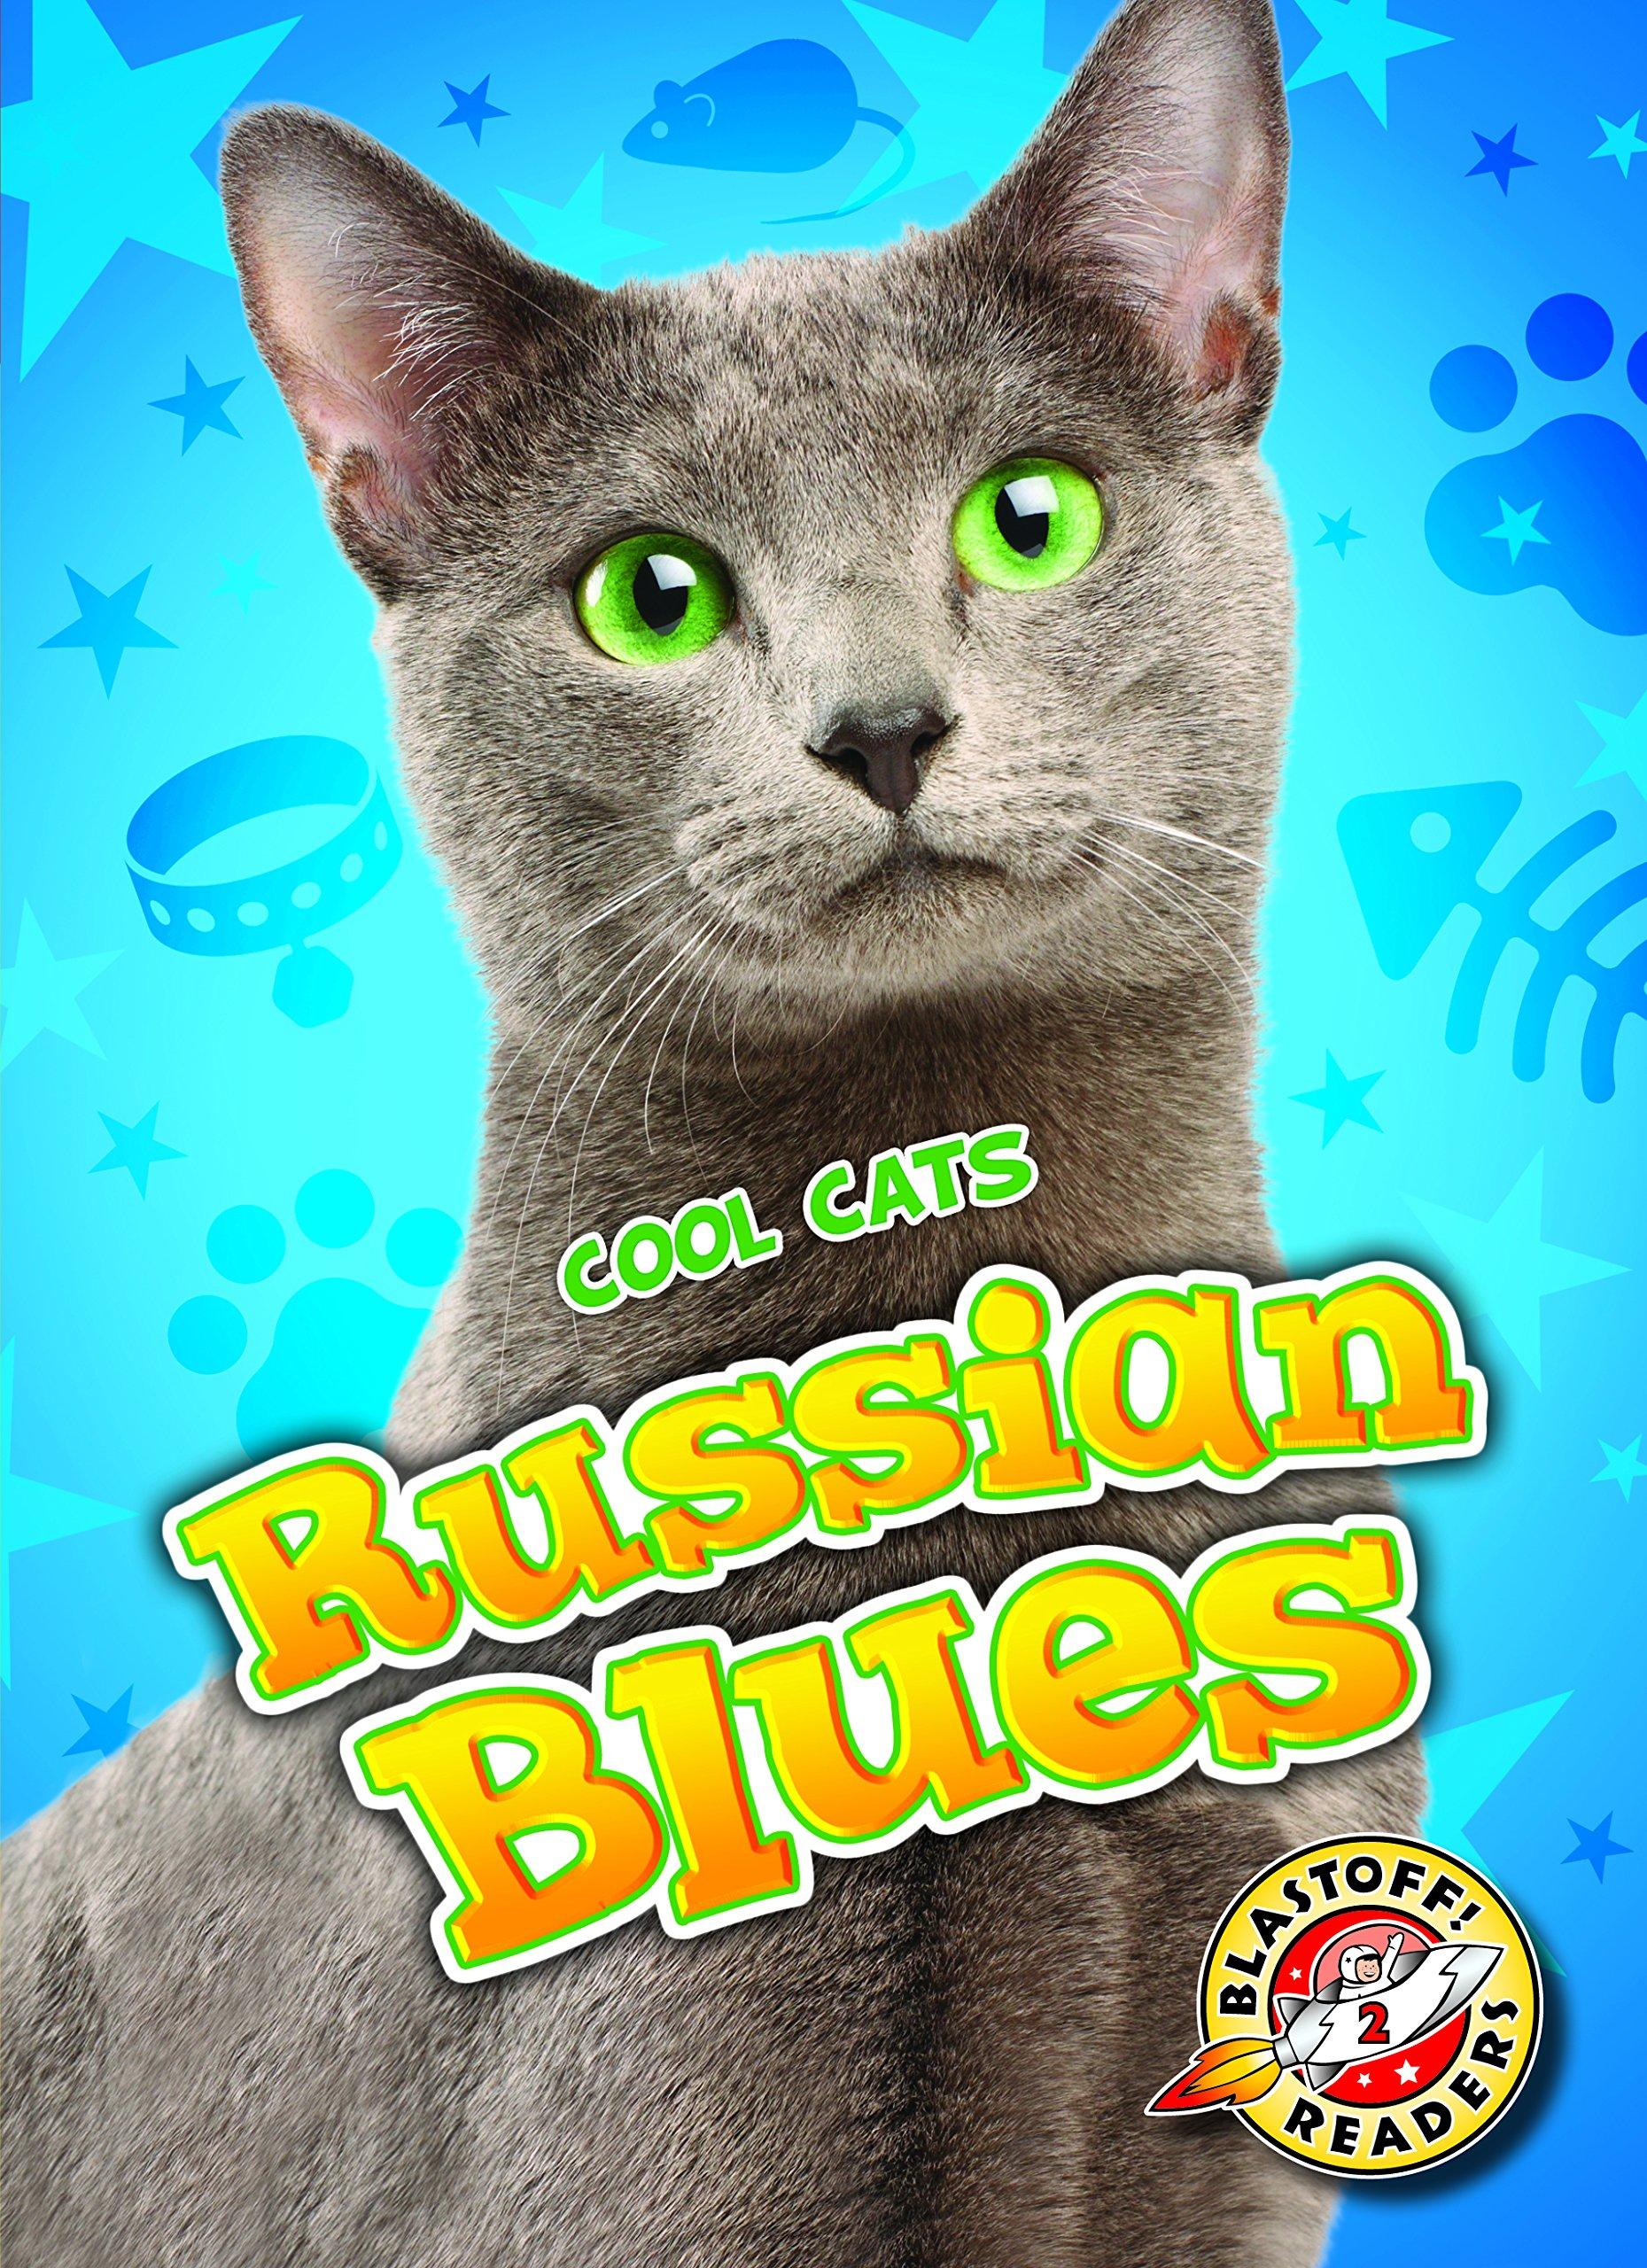 Russian Blues (Blastoff Readers. Level 2) ebook